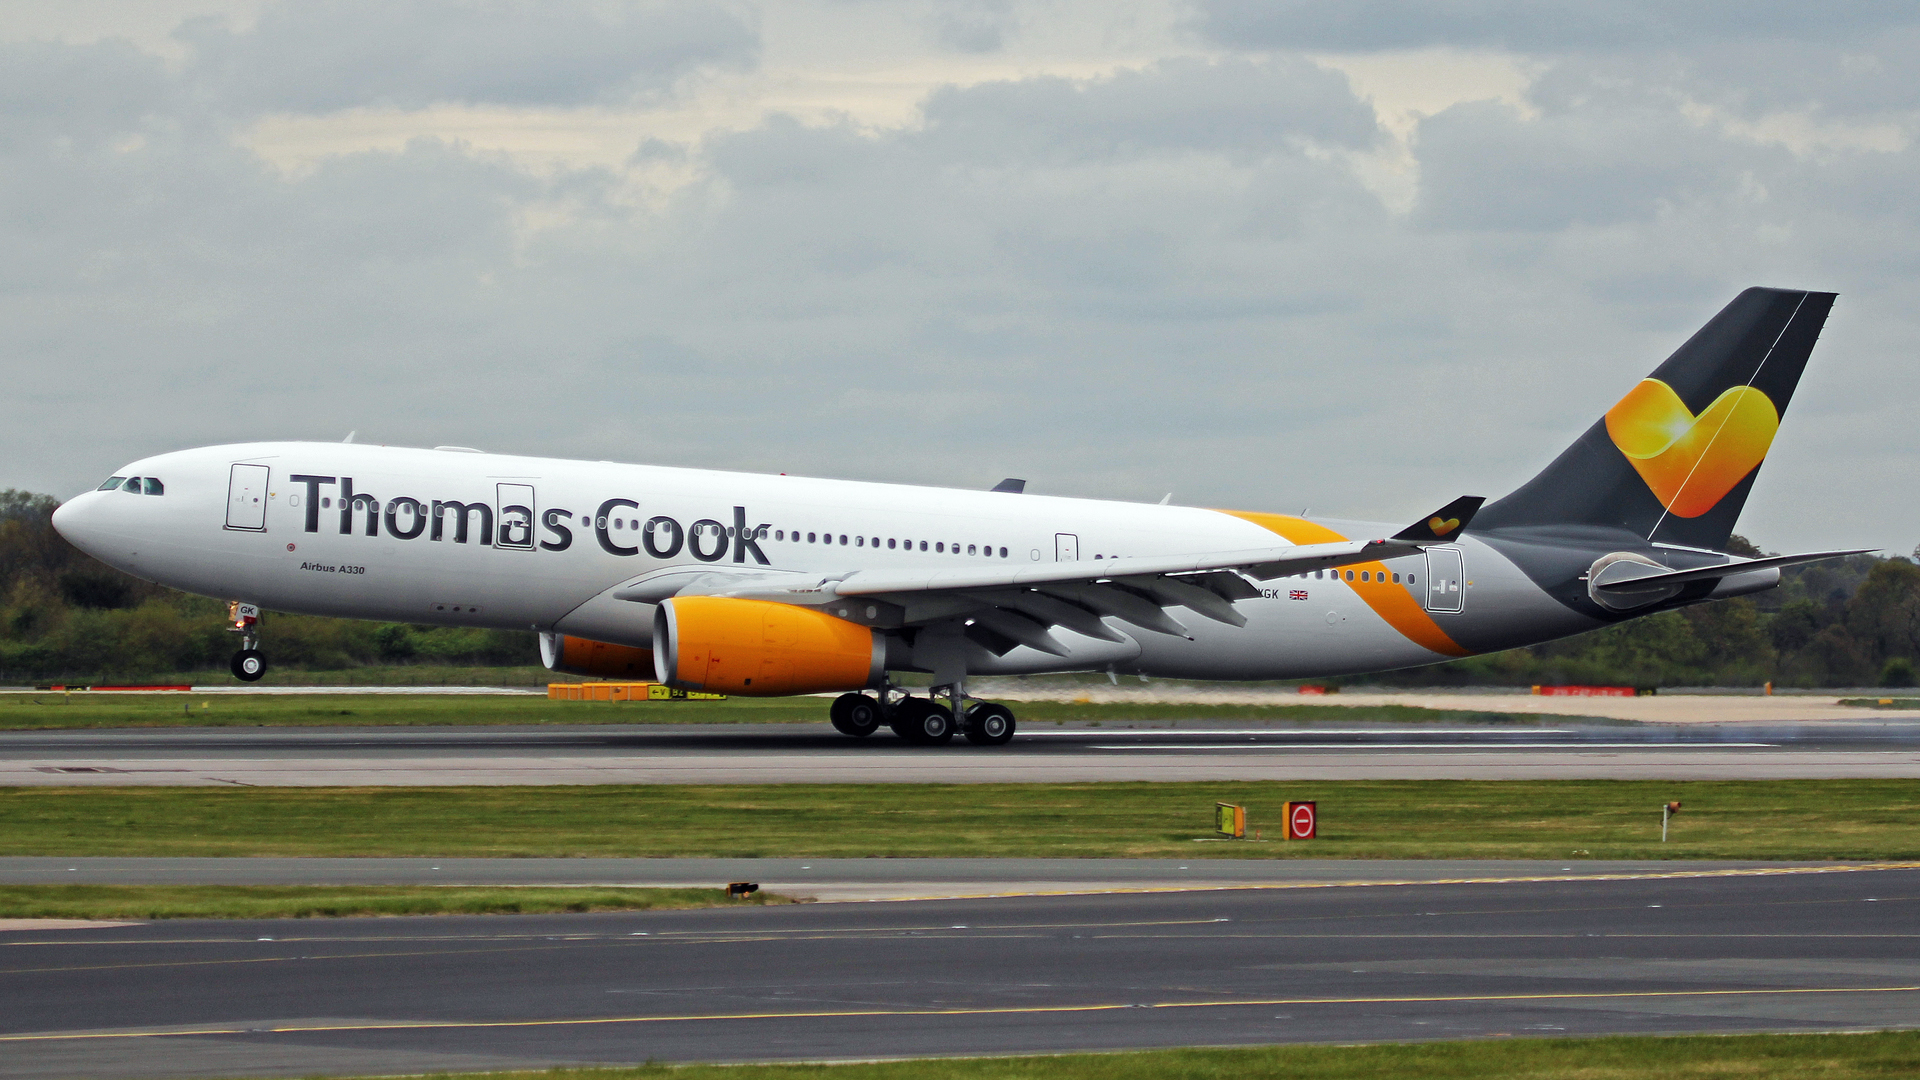 Thomas Cook Plane Taking Off